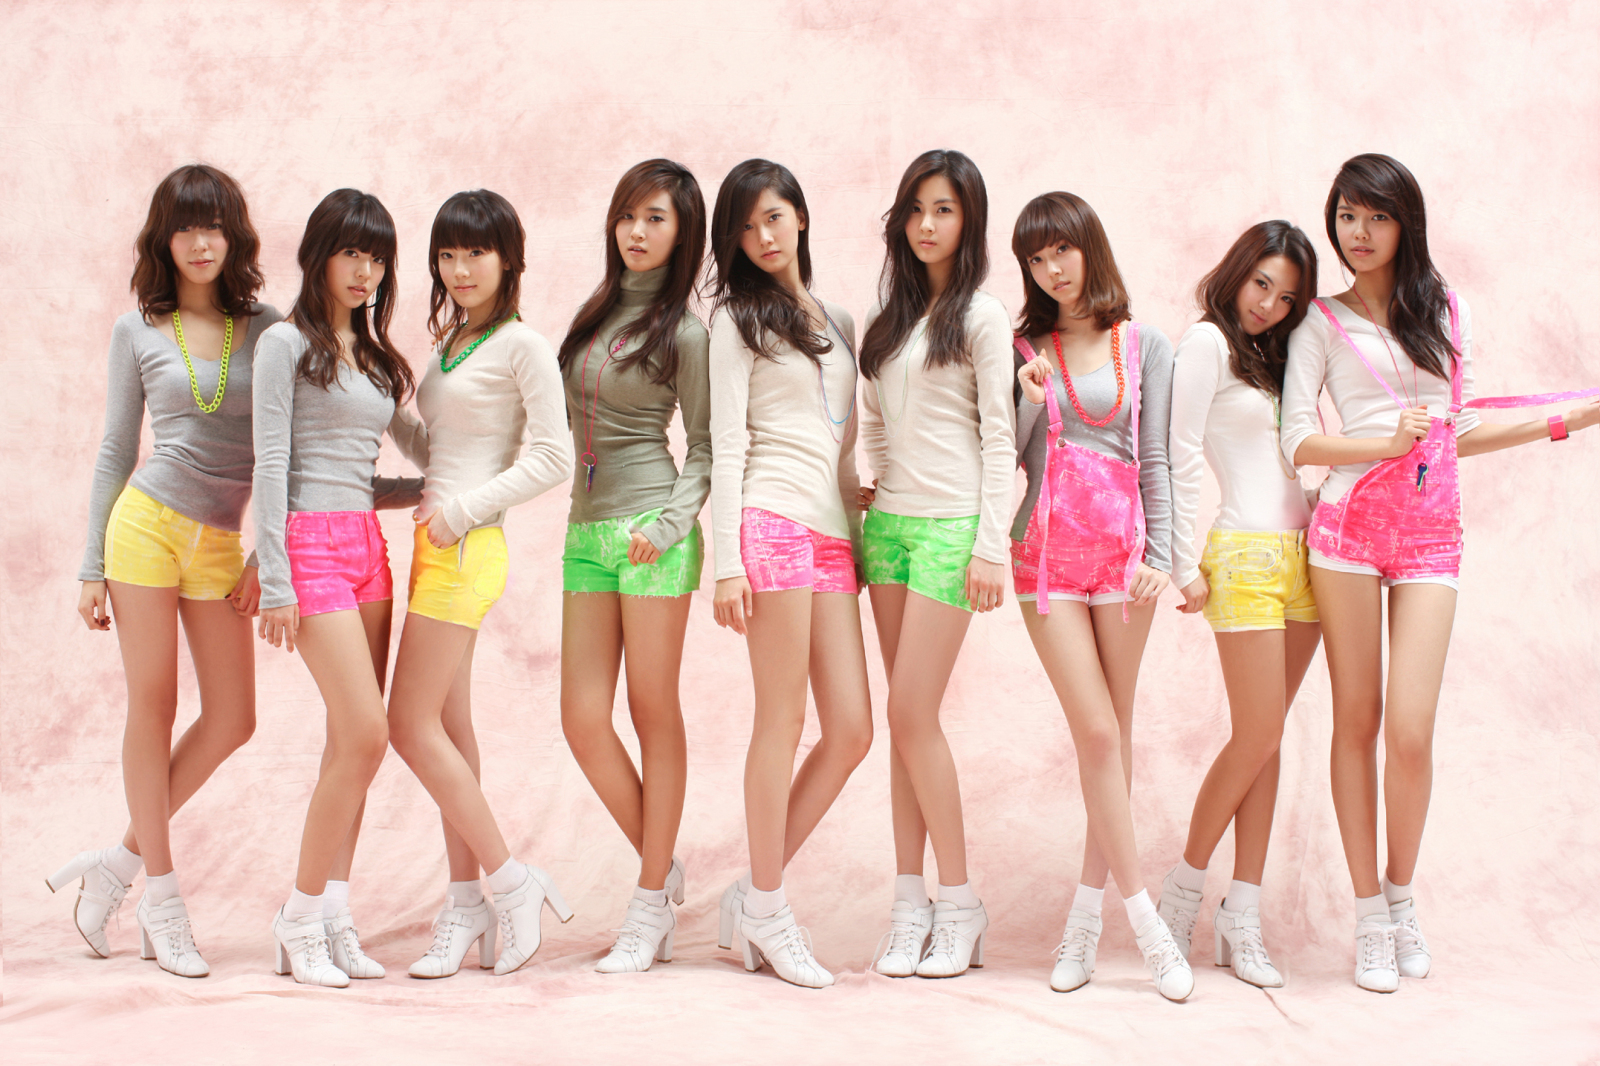 kpop-chicas